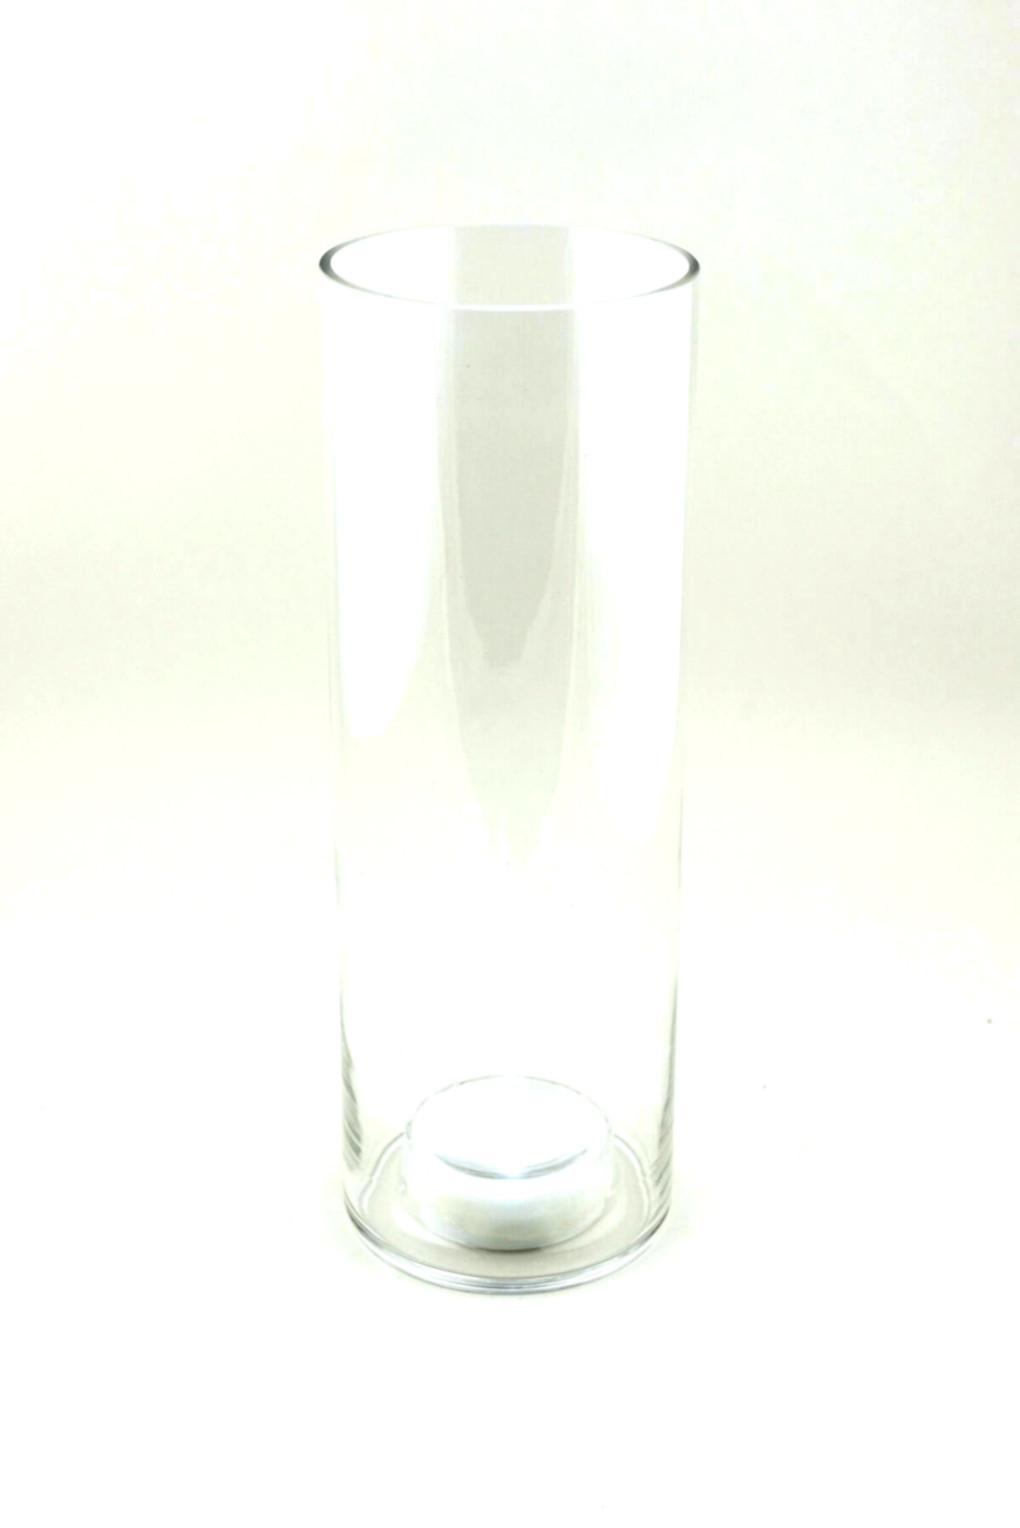 12 inch glass cylinder vase of 12 glass cylinder vase bulk billedgalleri saude mental with 12 inch cylinder vases bulk wilmingtonncbeerweek